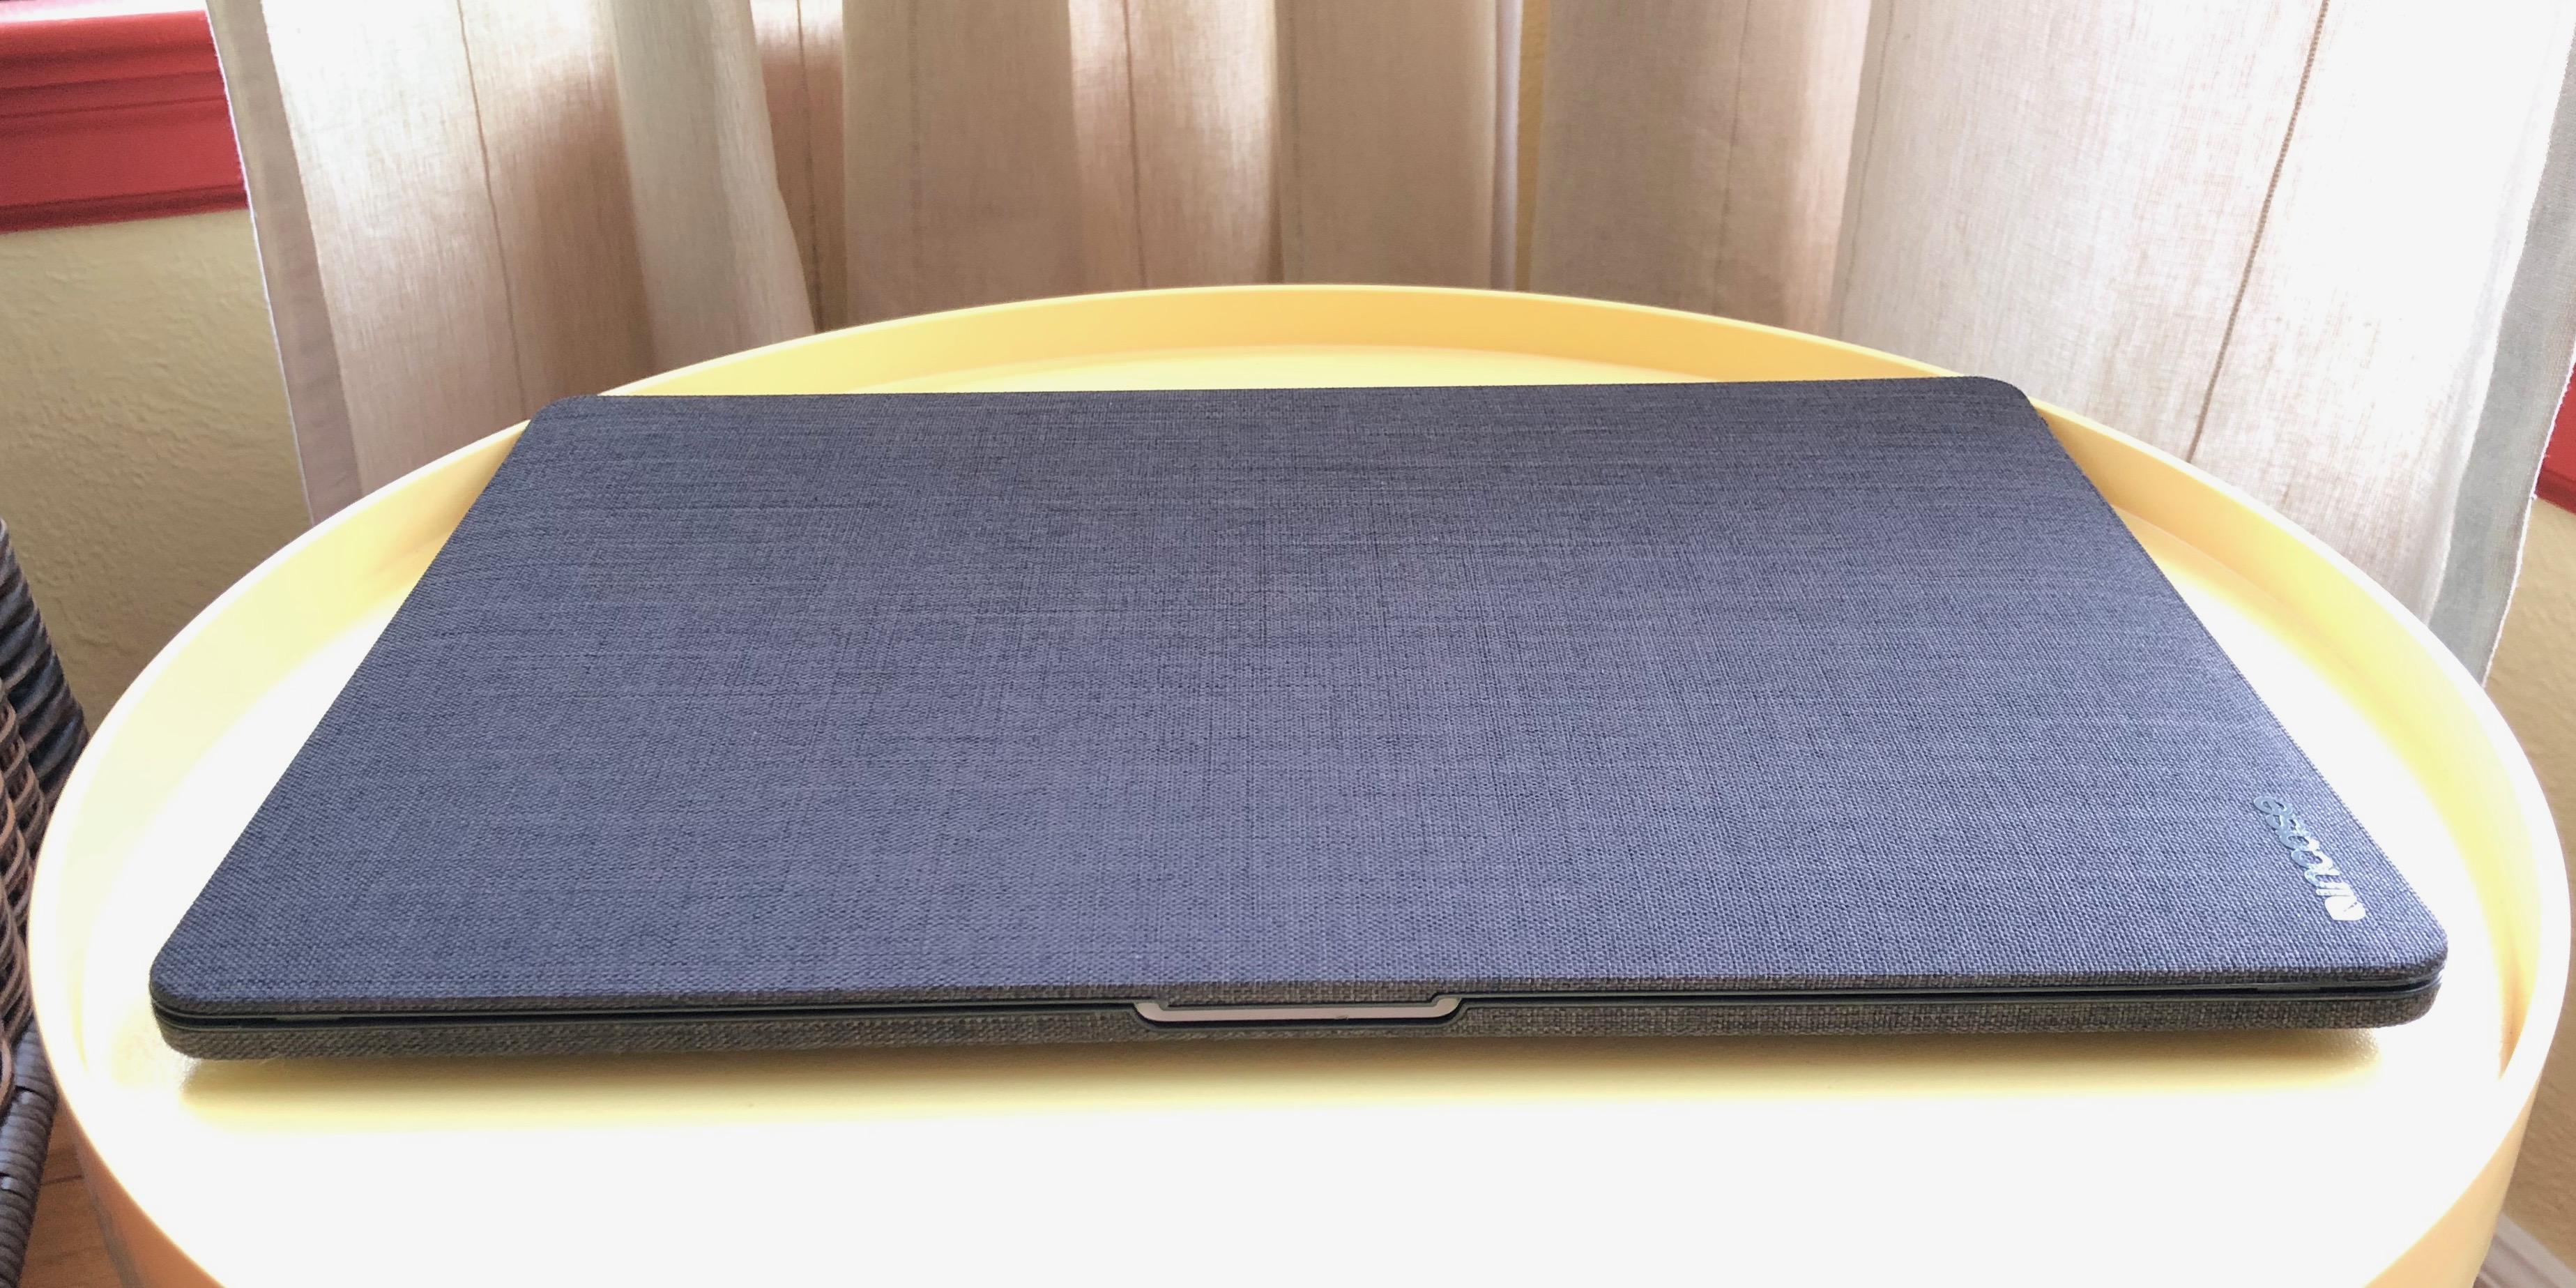 Incase Textured Hardshell MacBook Pro Graphite